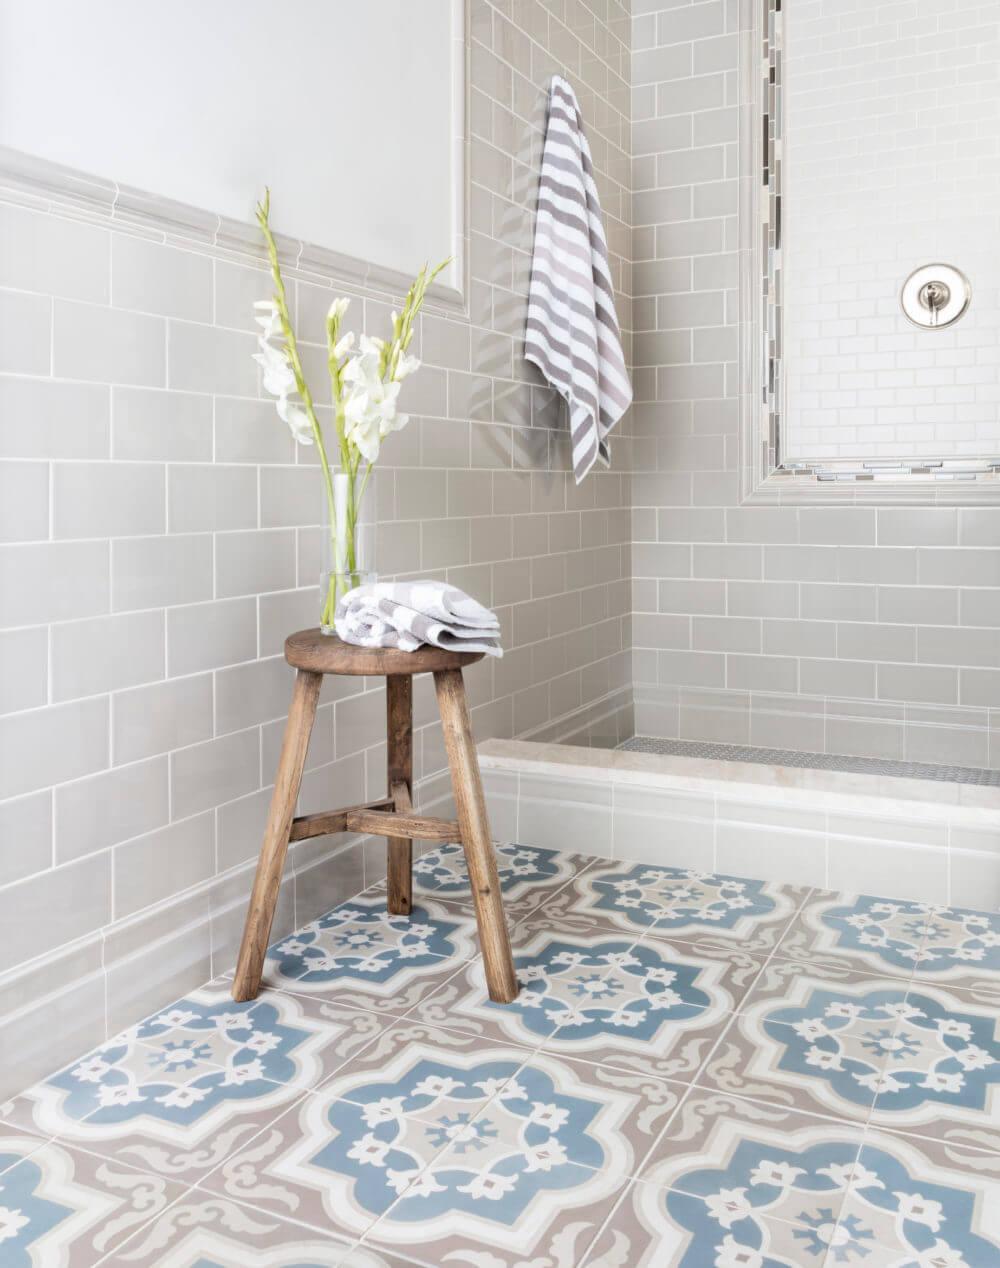 Appealing bathroom floor